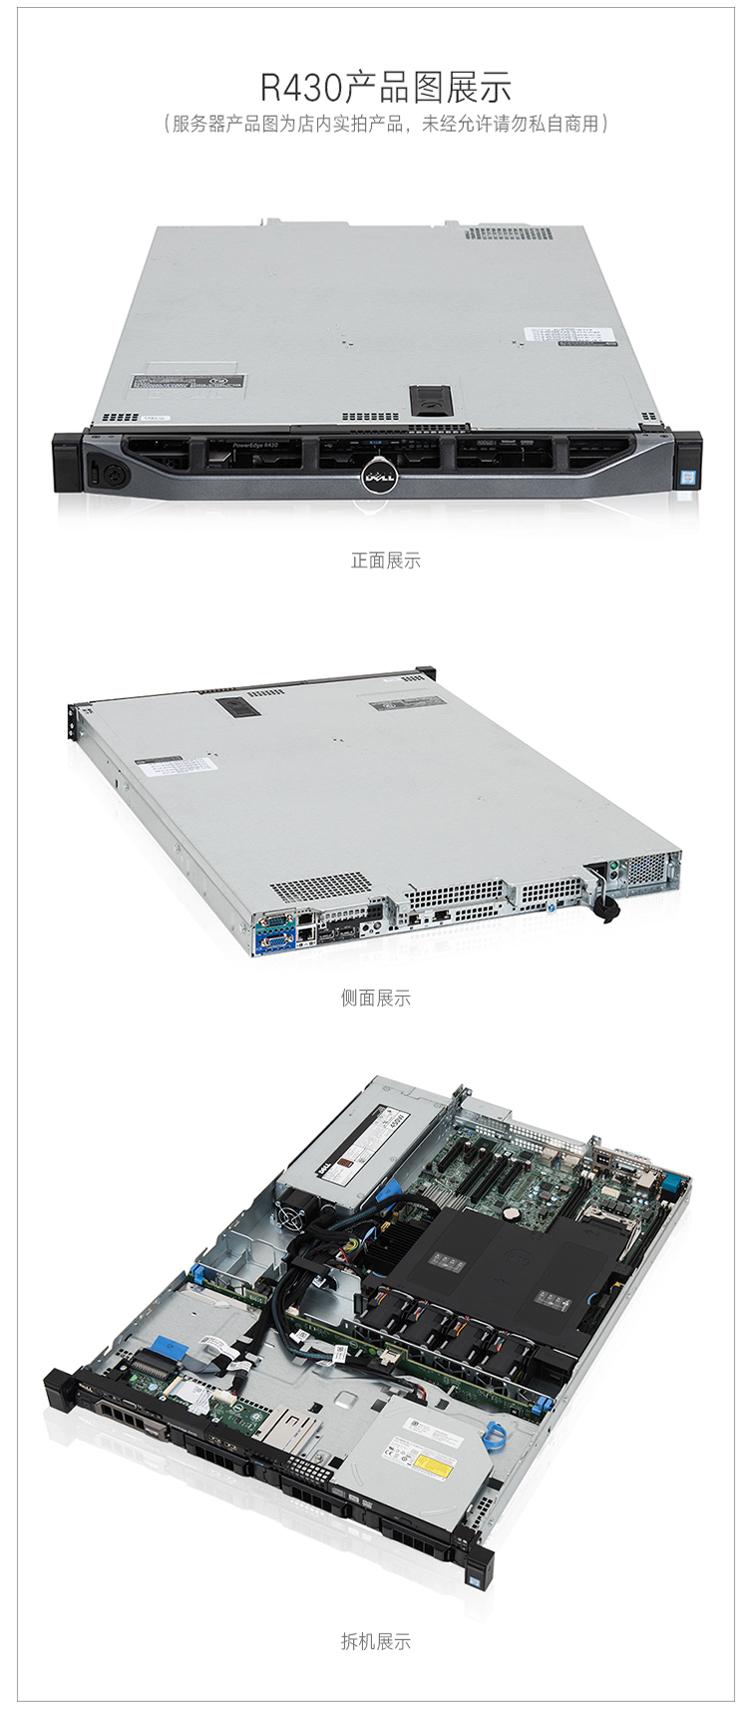 DELL 戴尔R430 1U机架式ERP服务器主机可升级H7...-京东